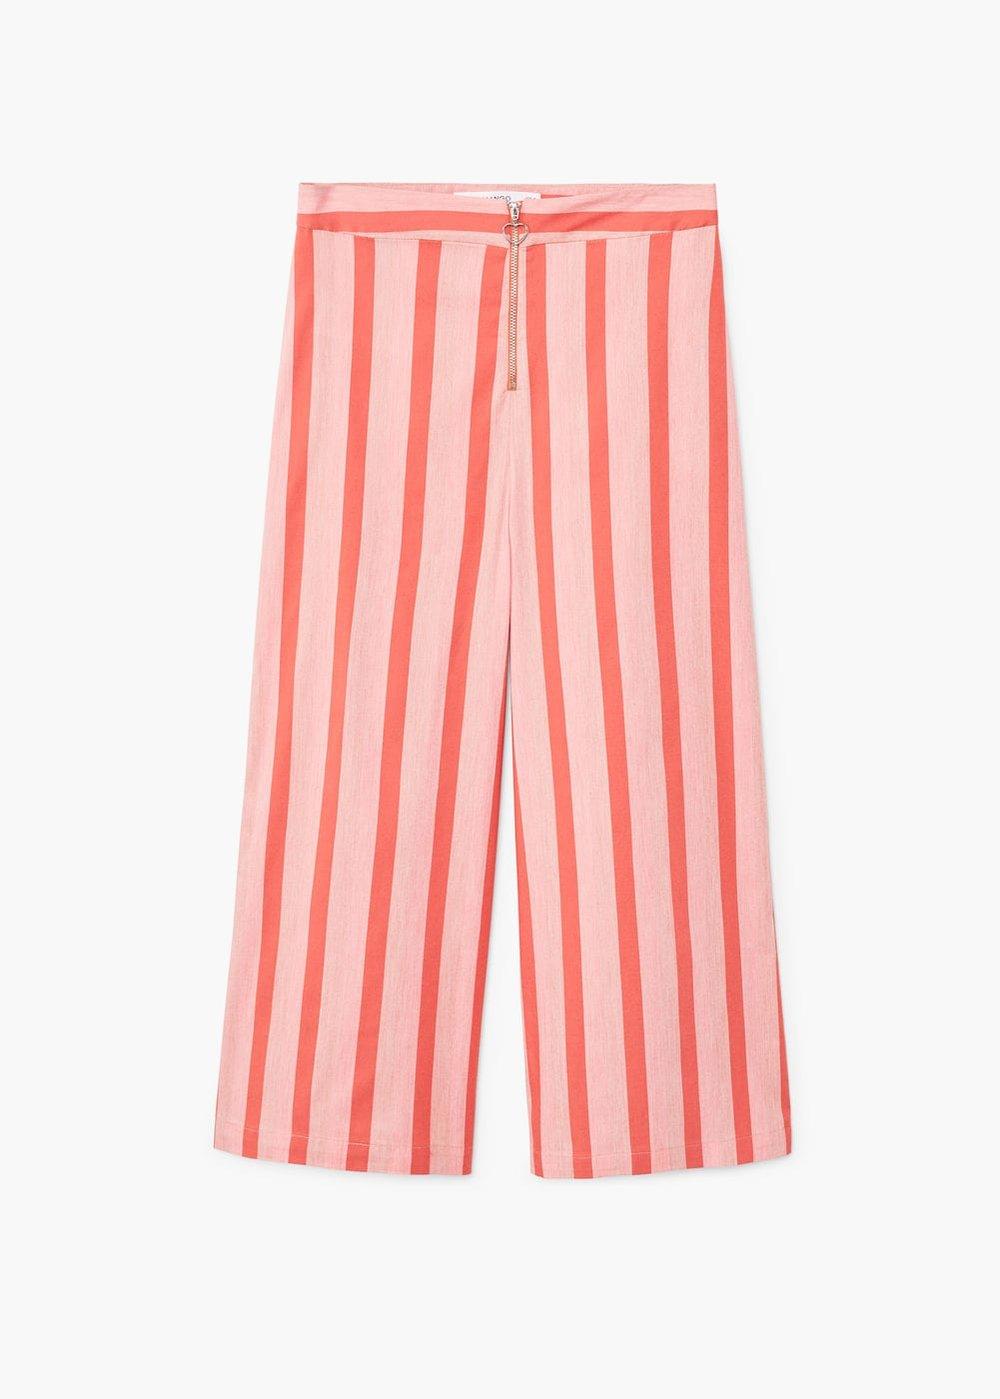 MANGO Striped crop trousers $79.99